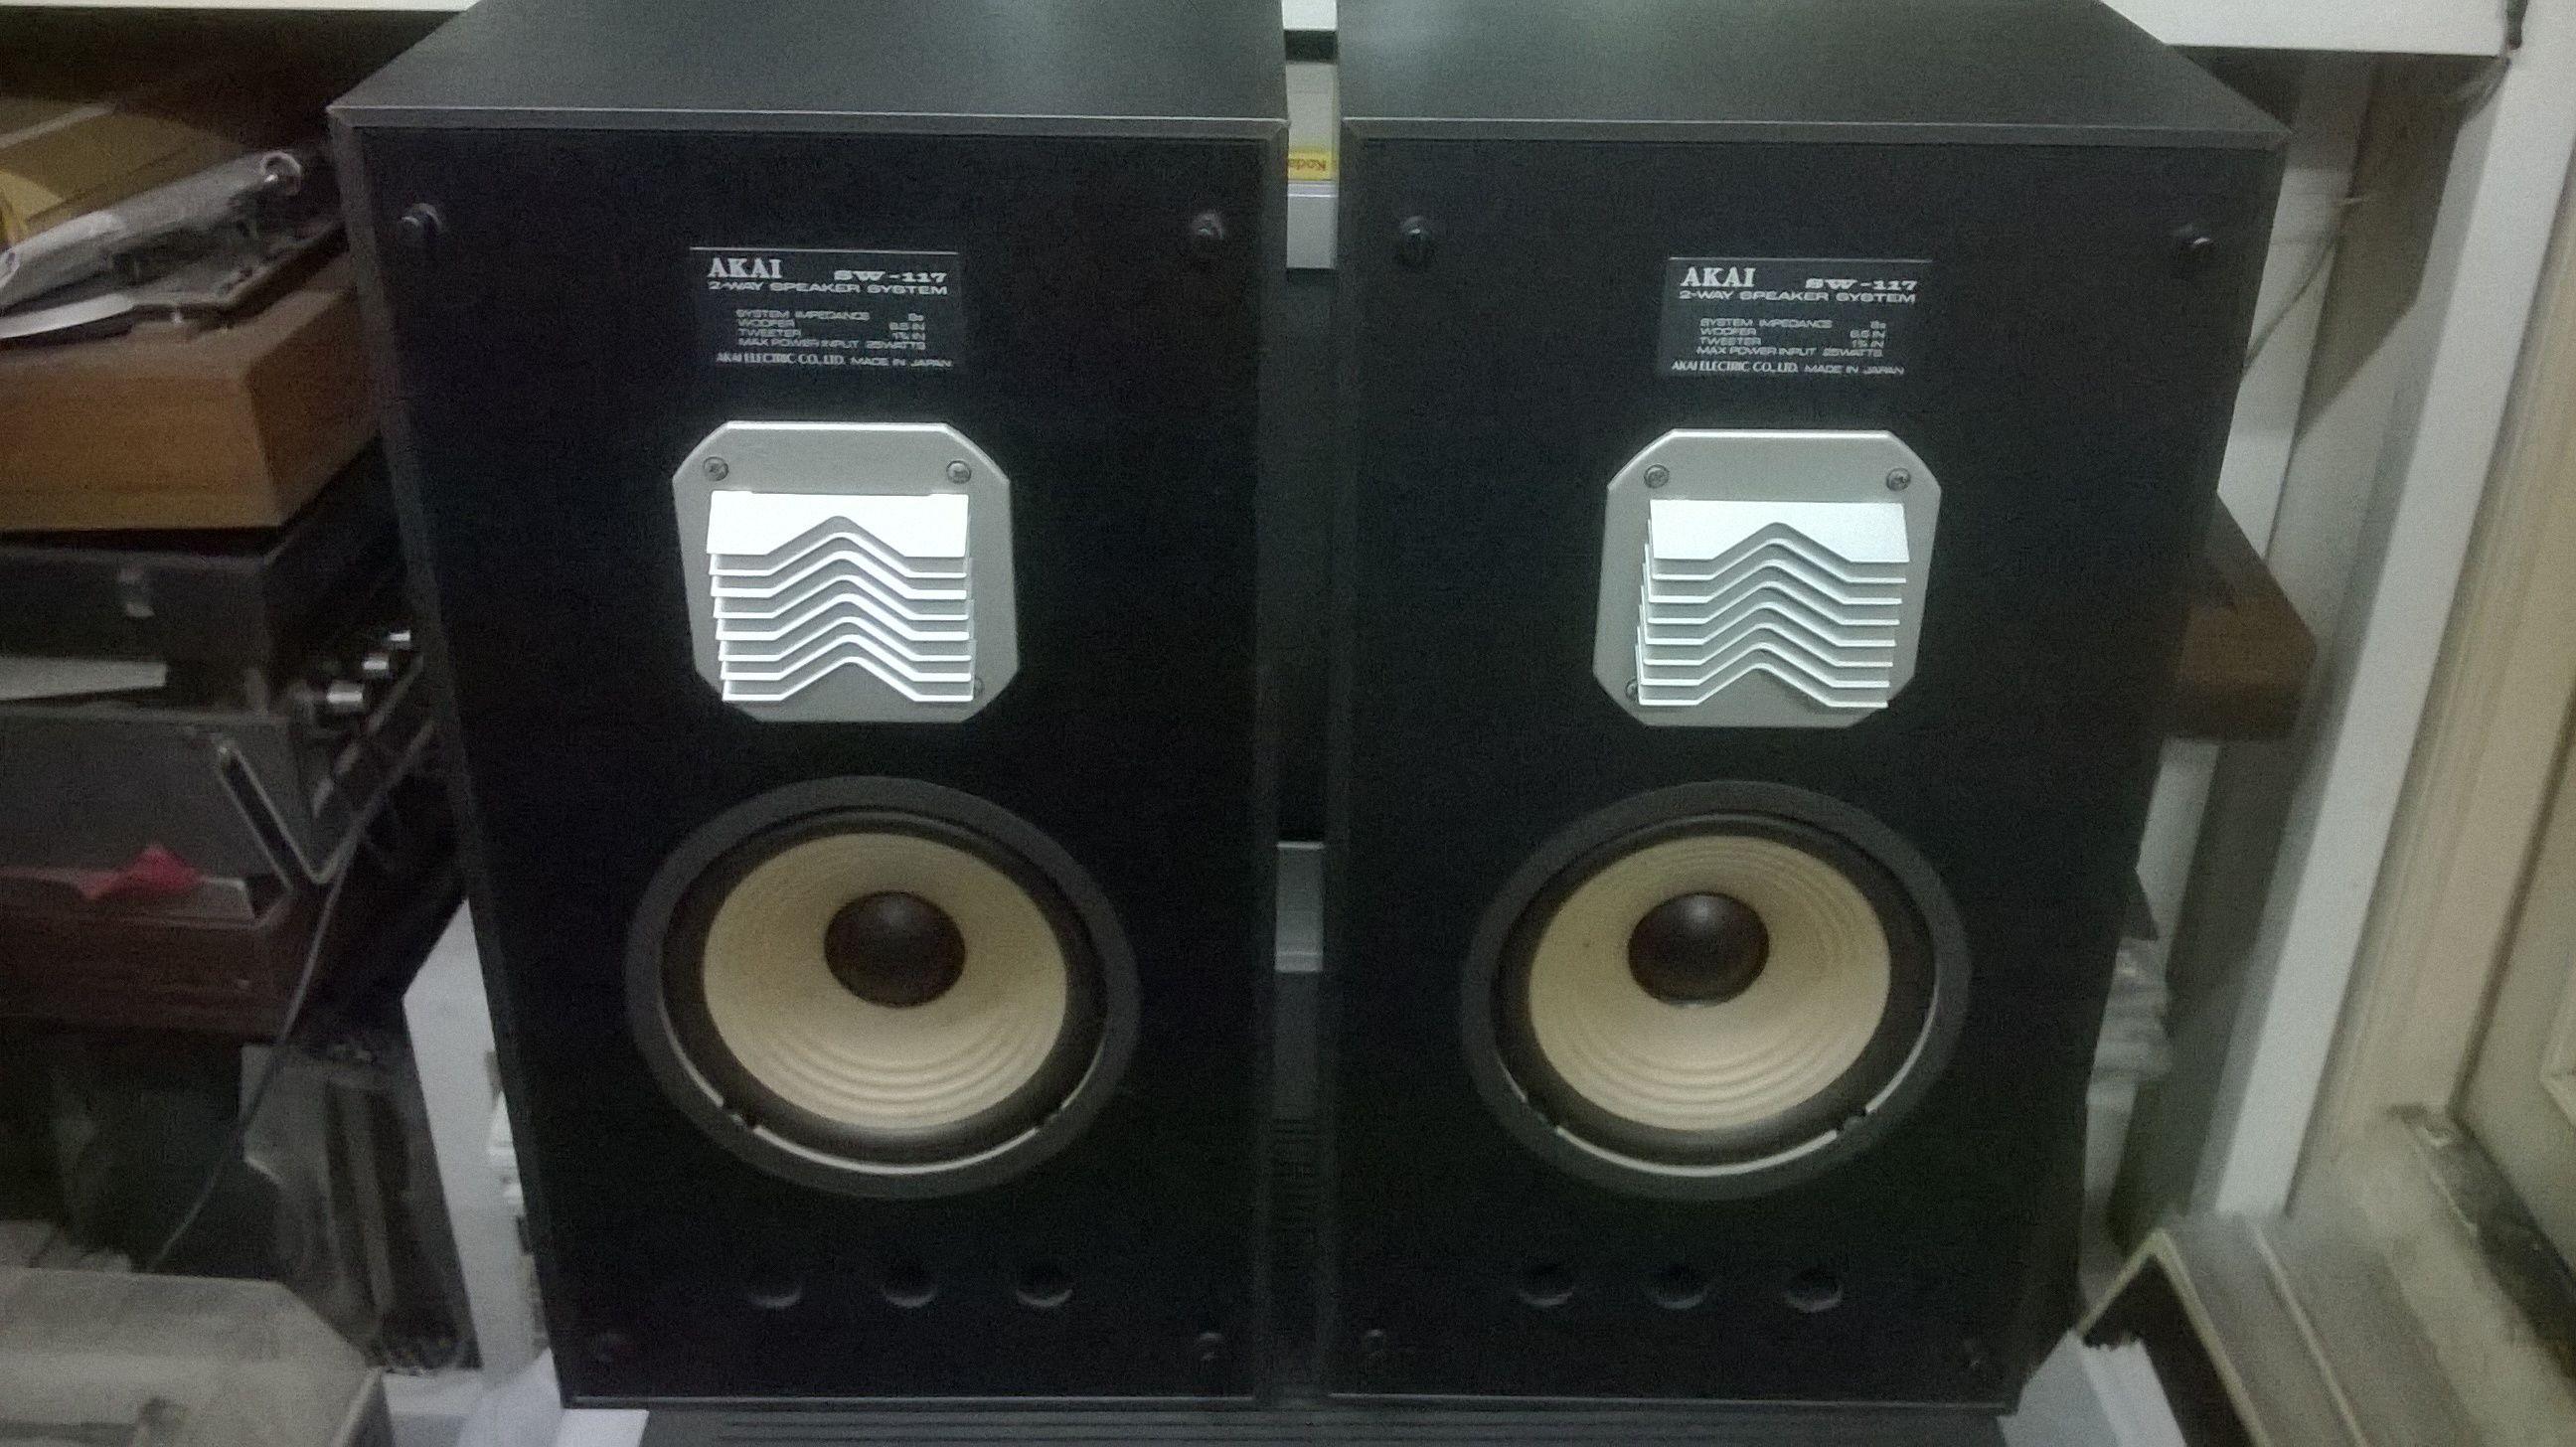 Akai Japan Sw 117 2 Way Speakers System Music System Vintage Music Vinyl Records